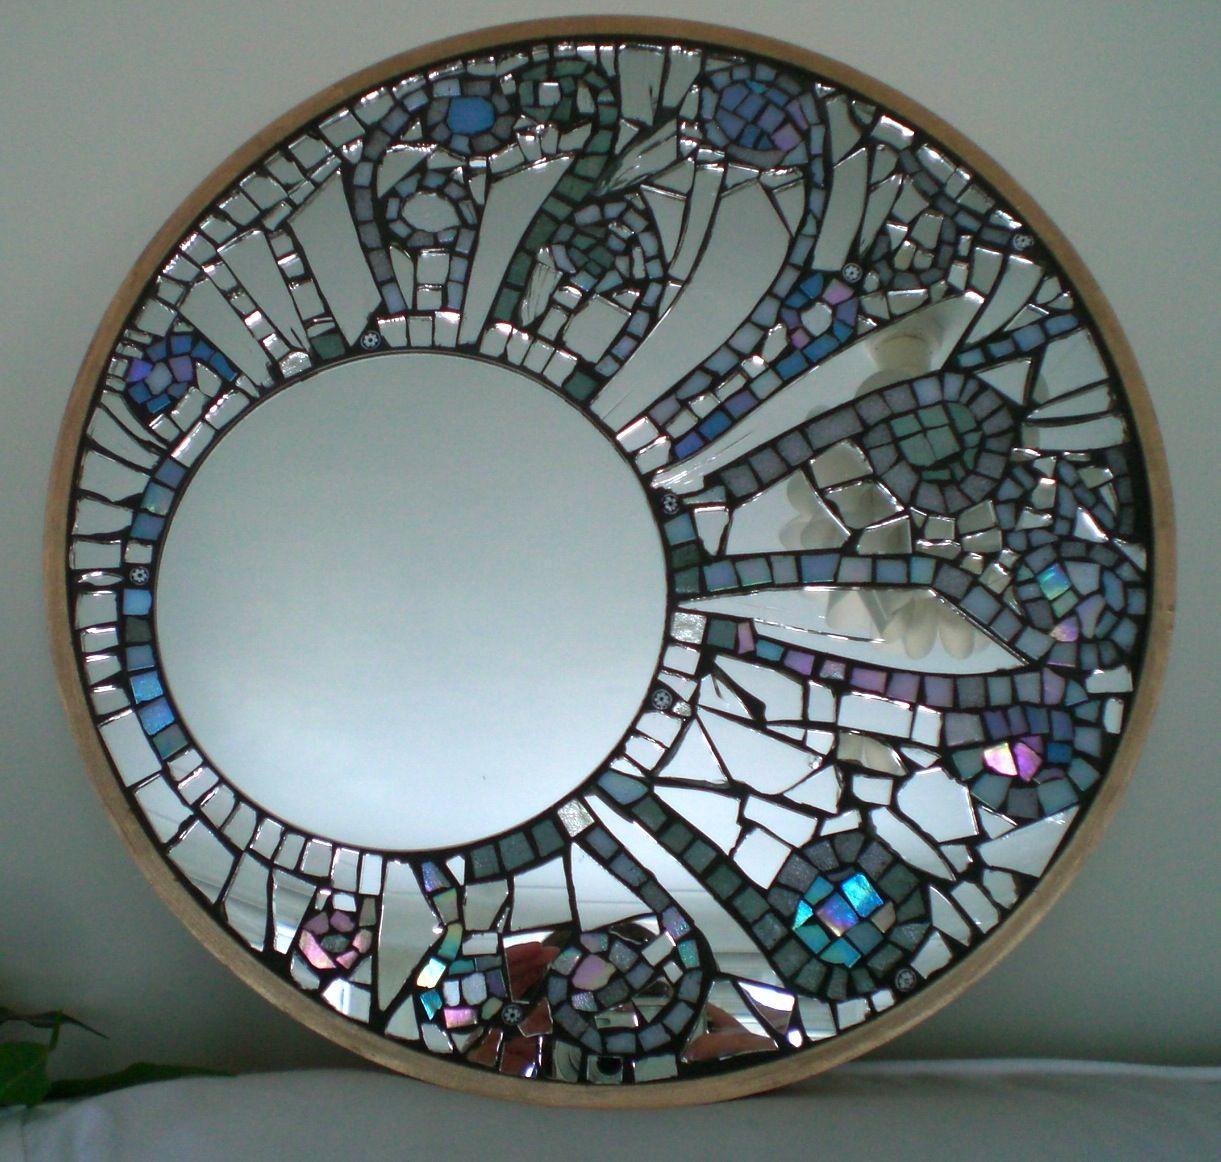 mirrormosaic from mirrors pinterest mosaique miroirs et miroir mosaique. Black Bedroom Furniture Sets. Home Design Ideas